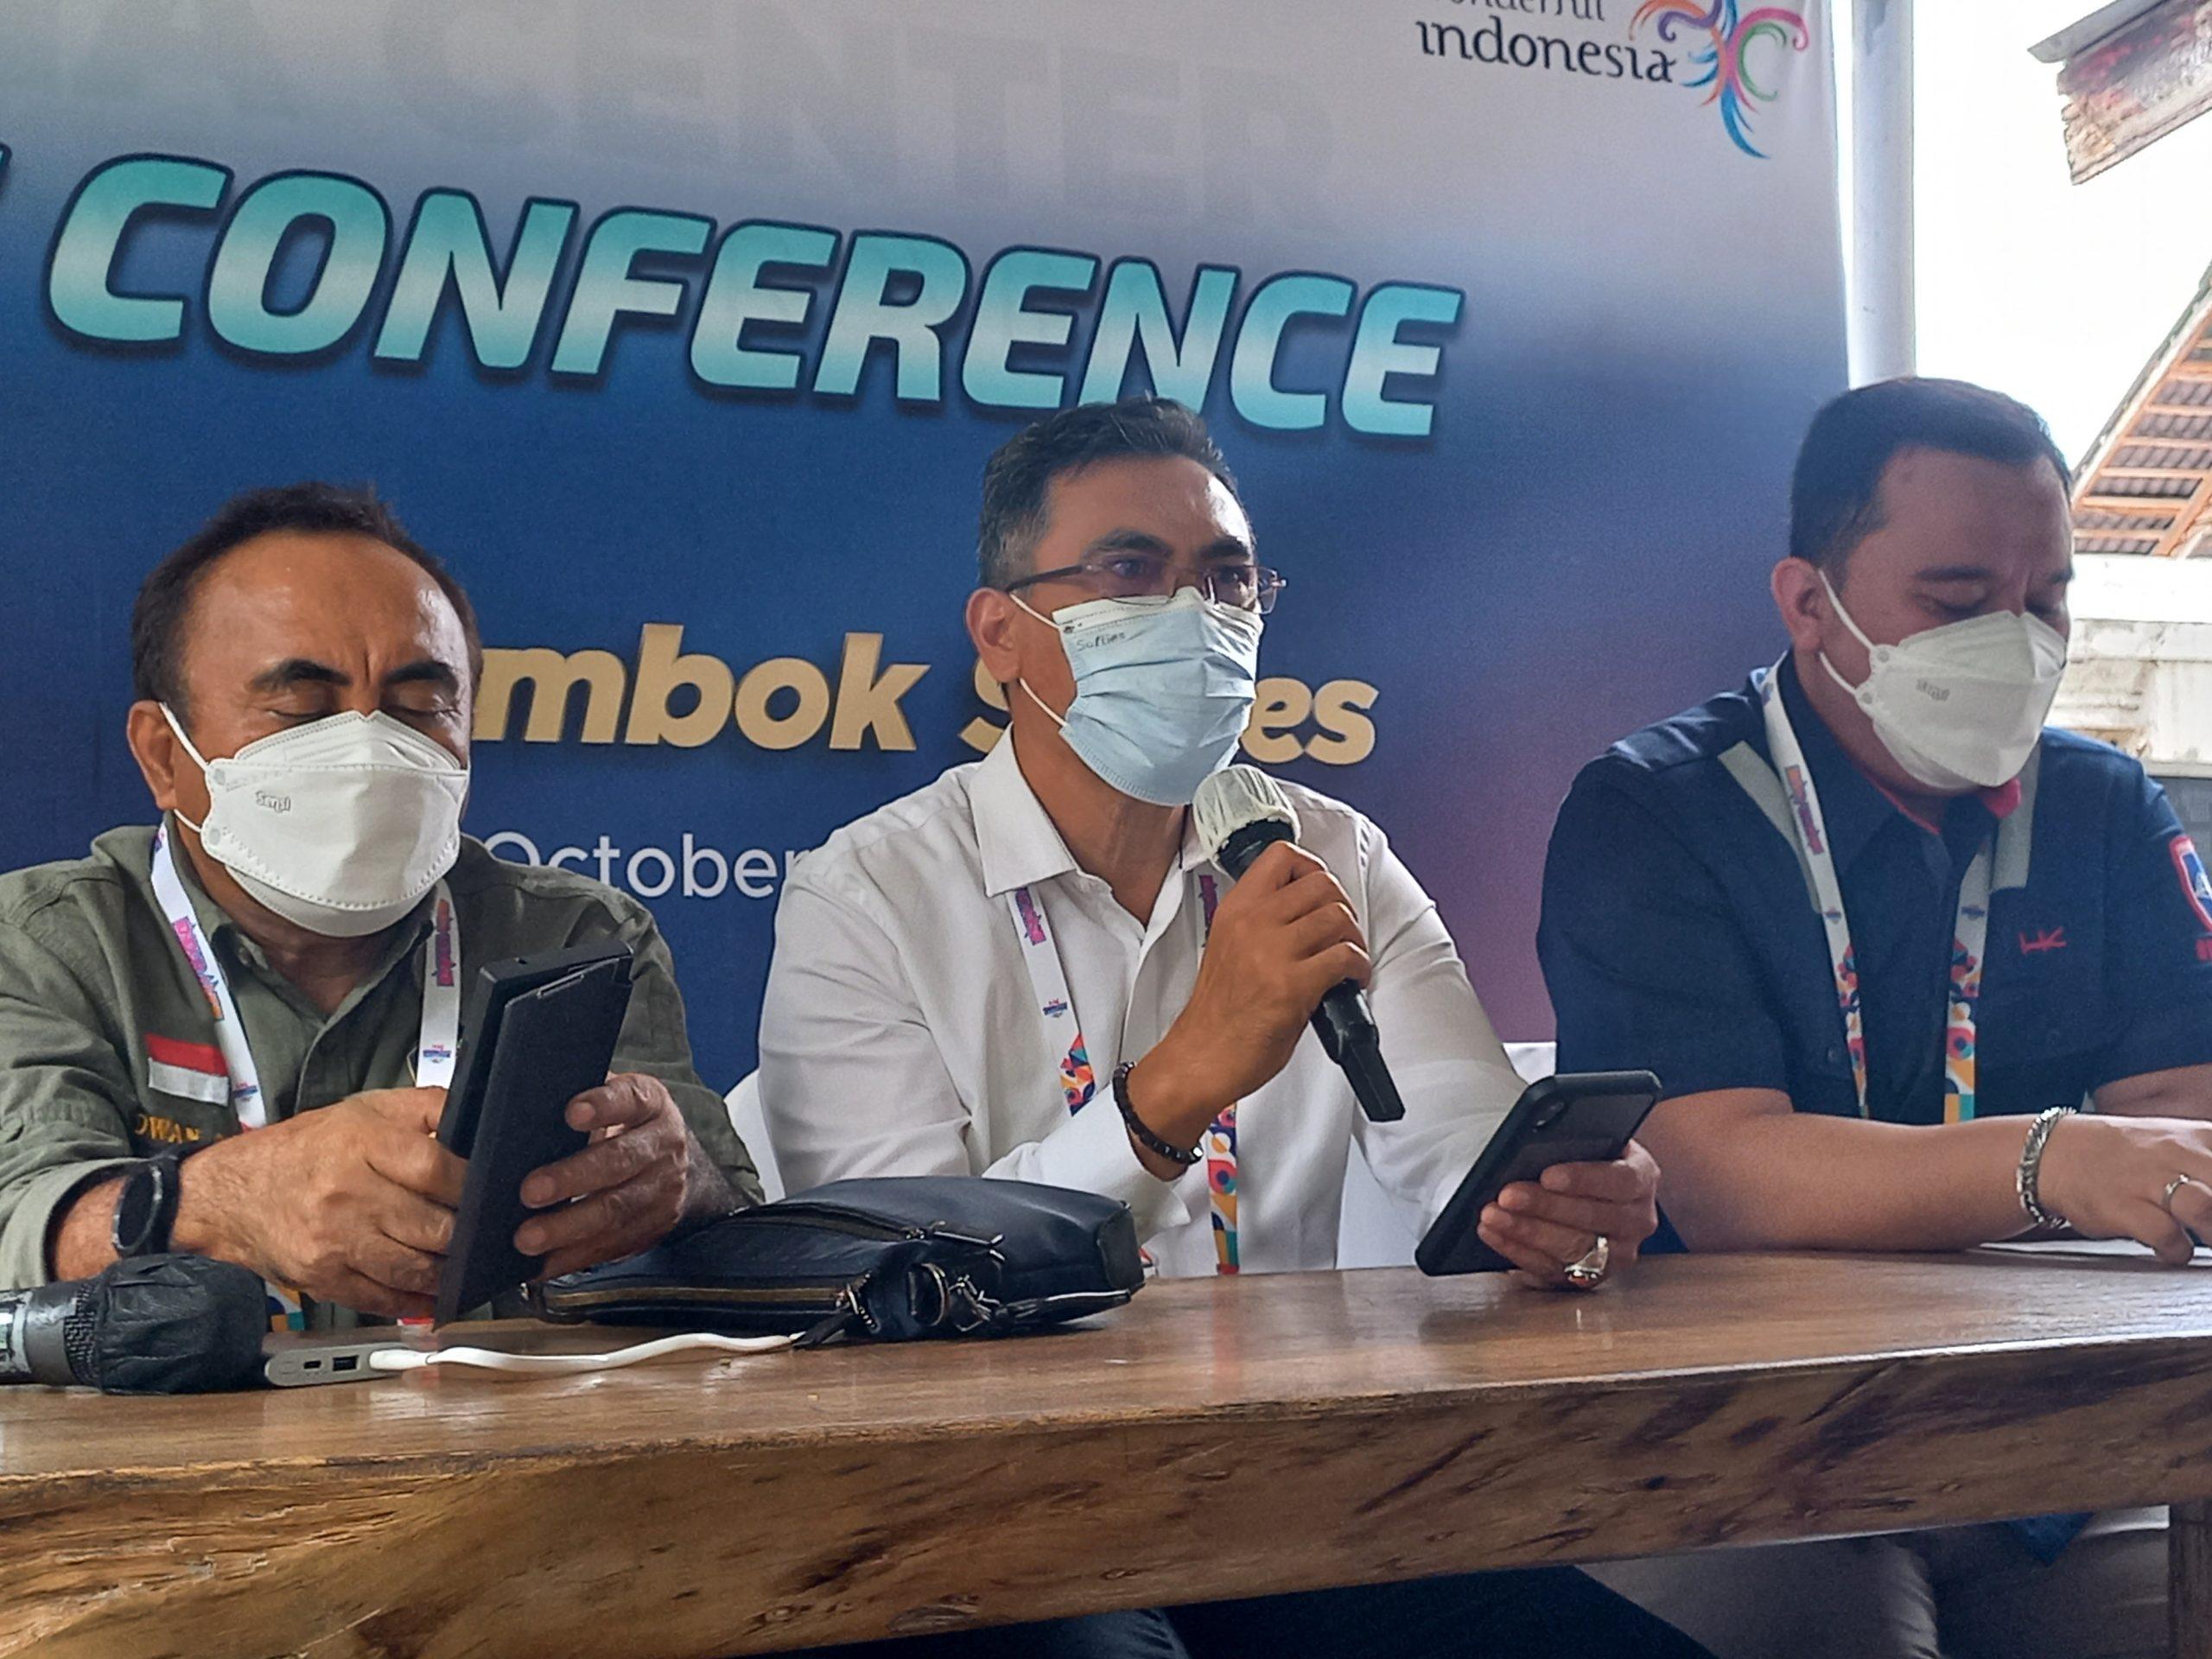 Pertama Kali di Indonesia, HK Endurance Challange 2021